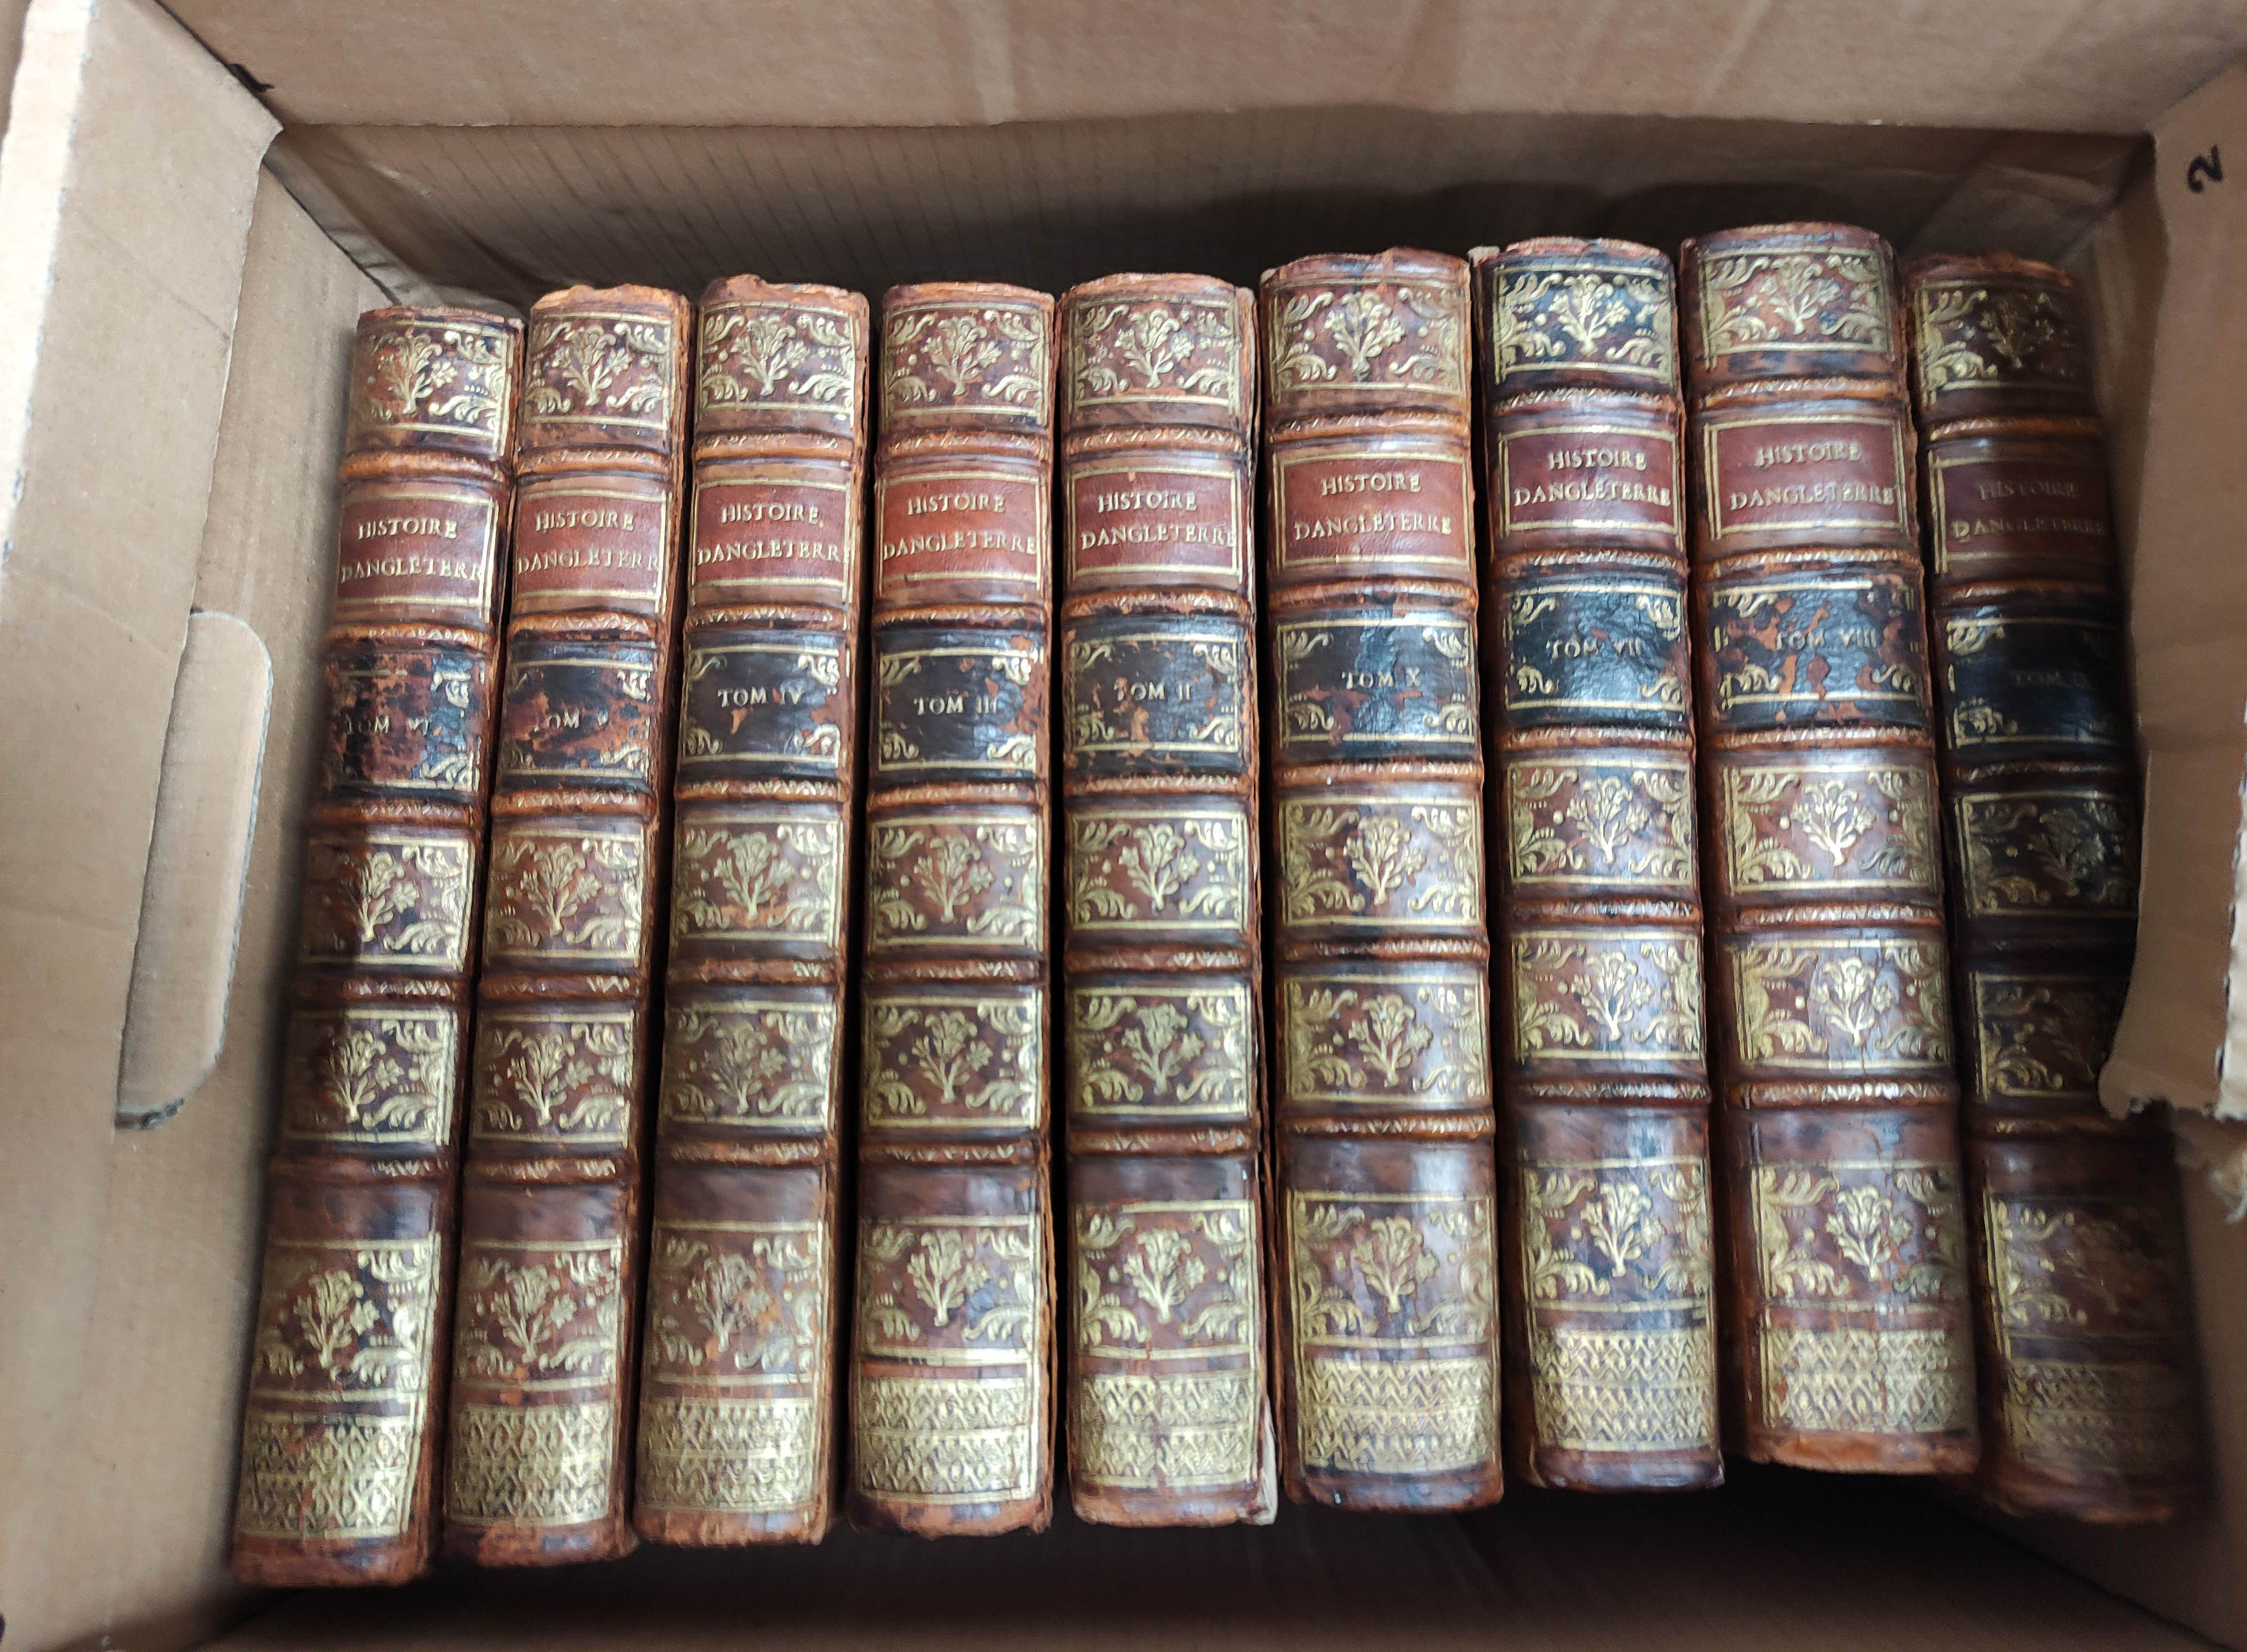 DE RAPIN THOYRAS.Histoire D'Angleterre. 10 vols. Eng. plates, fldg. tables, etc. Quarto. Calf. The